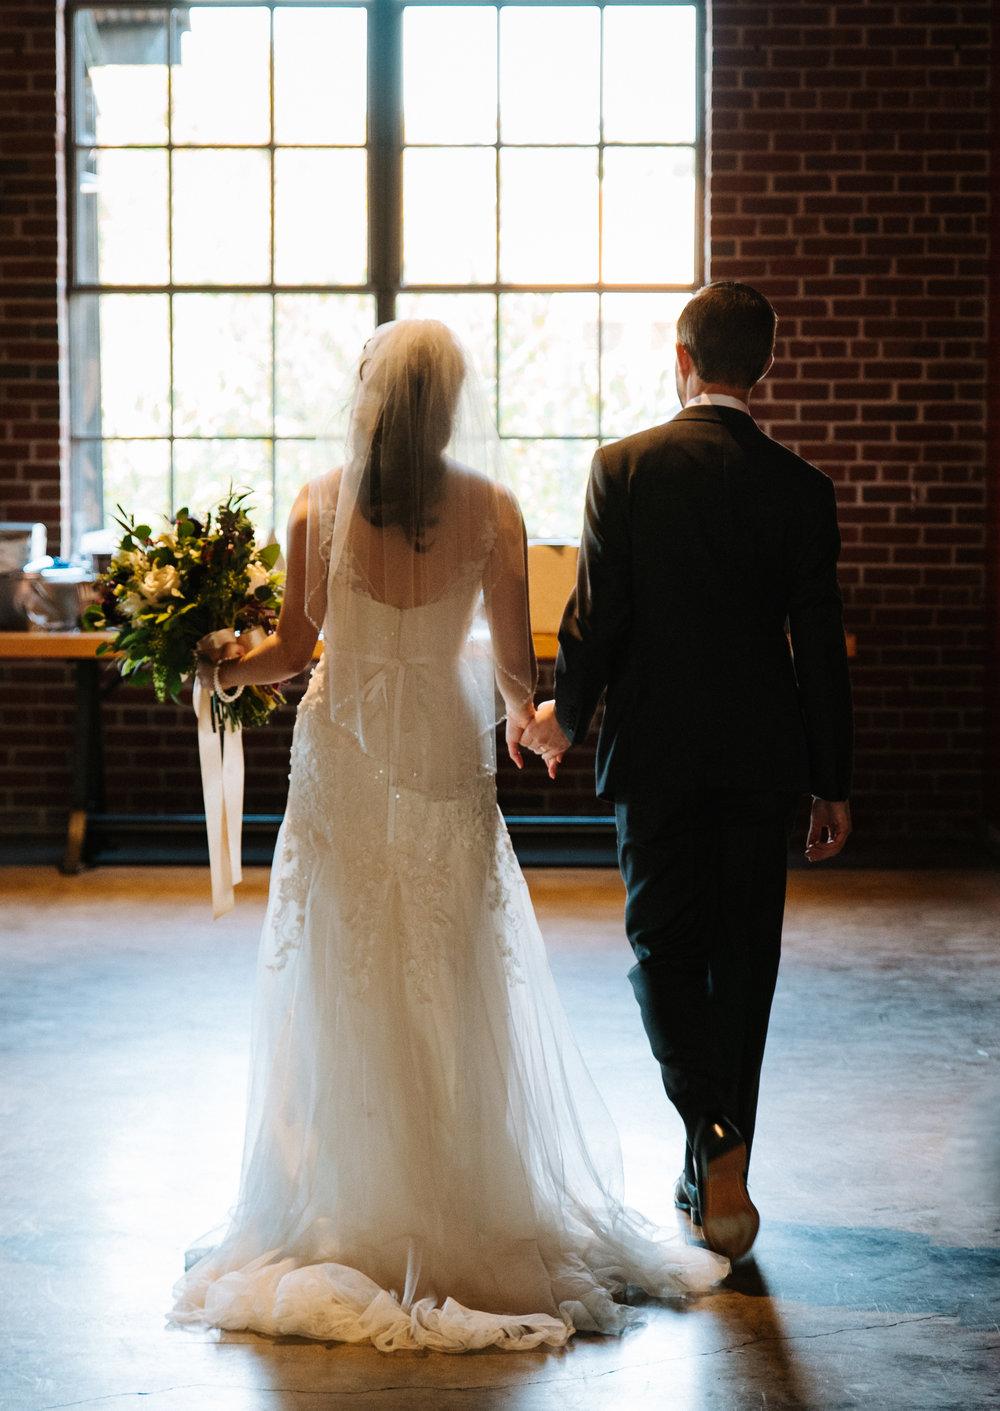 +Durham Wedding +North Carolina +Photographer +Wedding Photographer +Engagement Photographer +The Rickhouse-1837.jpg